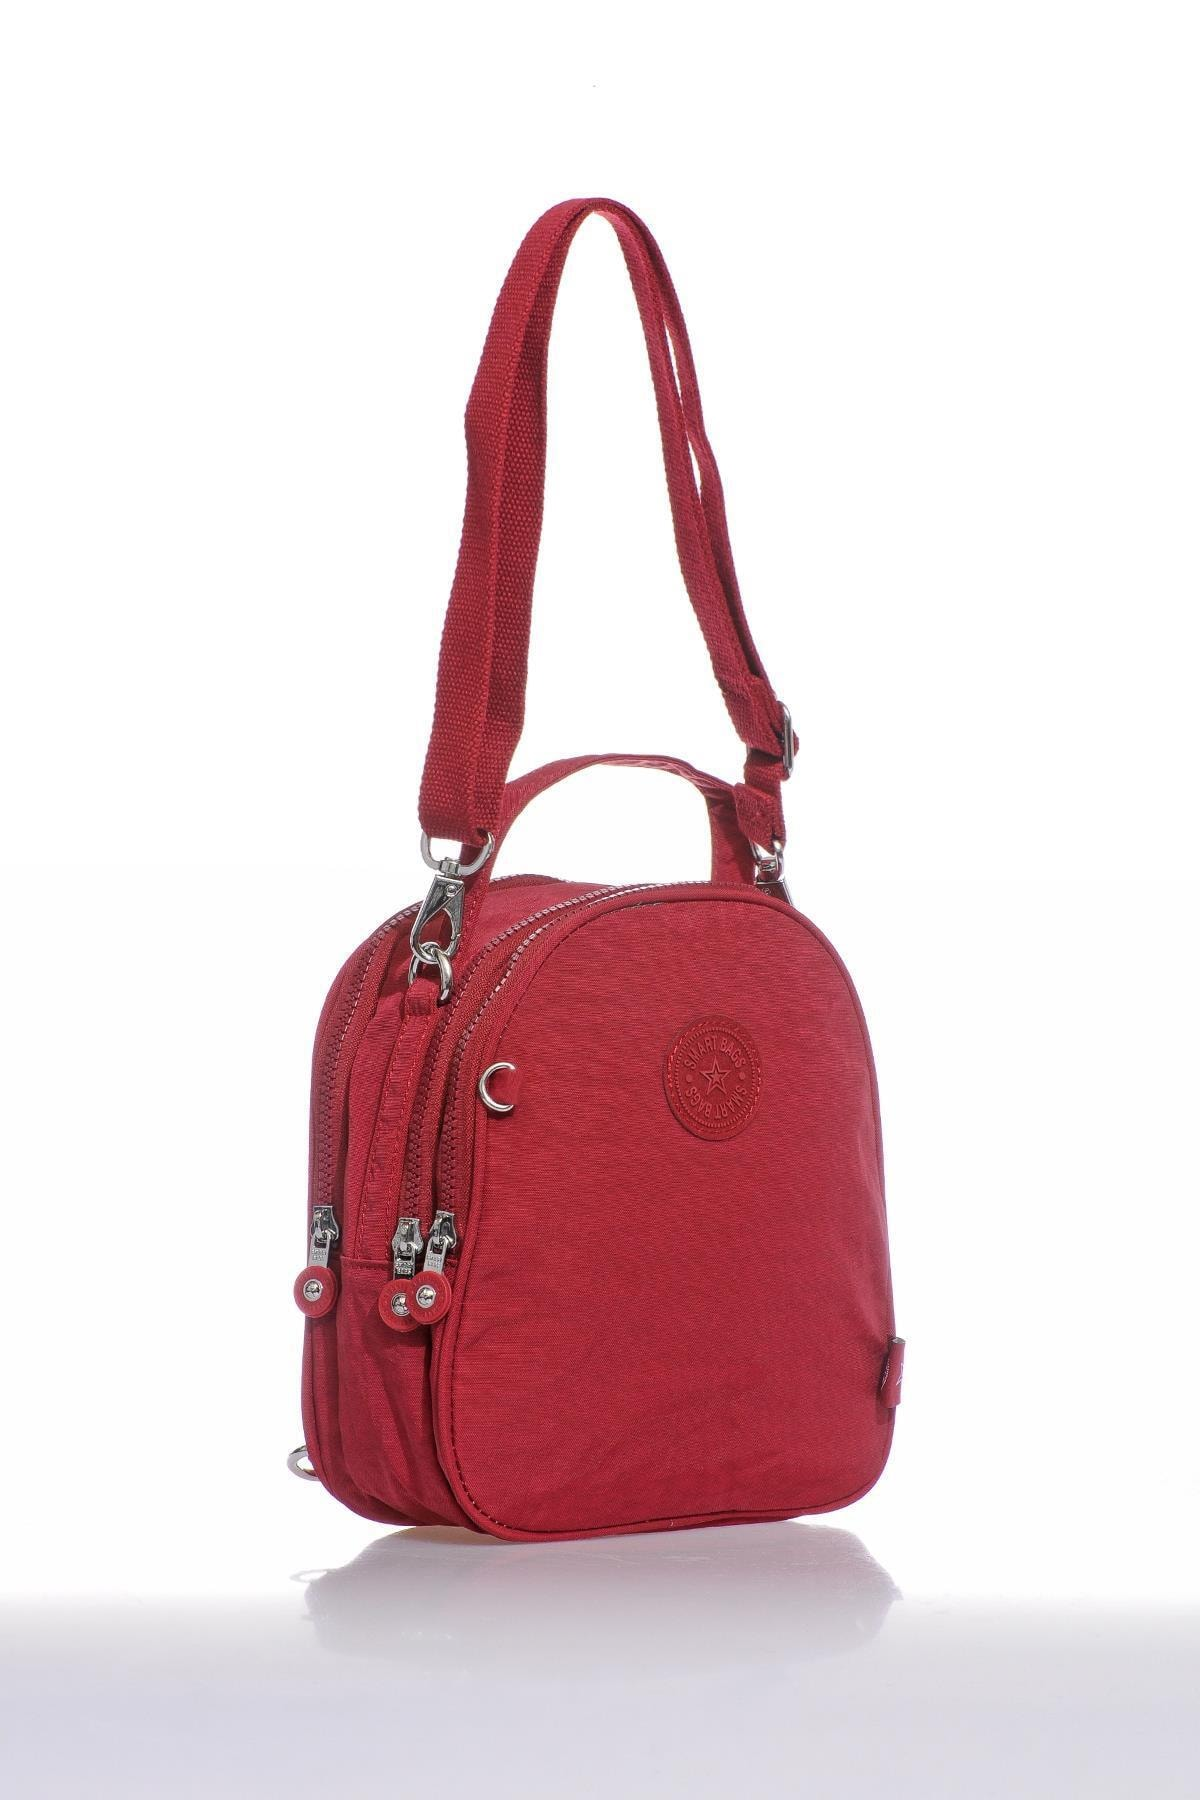 SMART BAGS Smb3063-0021 Bordo Kadın Sırt Çantası 2